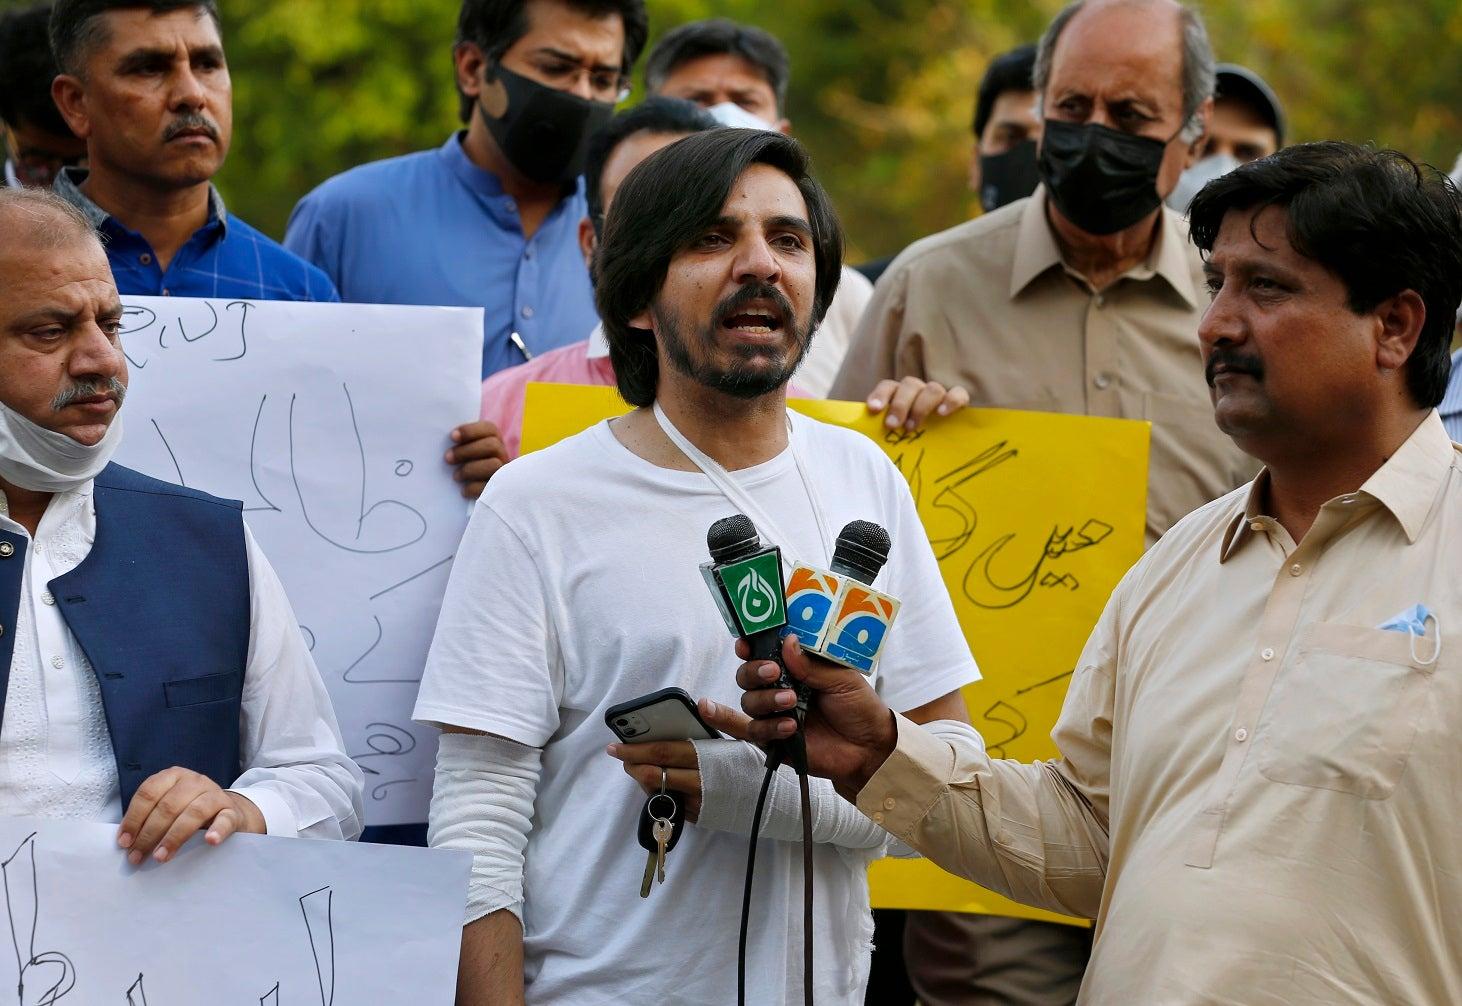 Pakistan: Escalating Attacks on Journalists